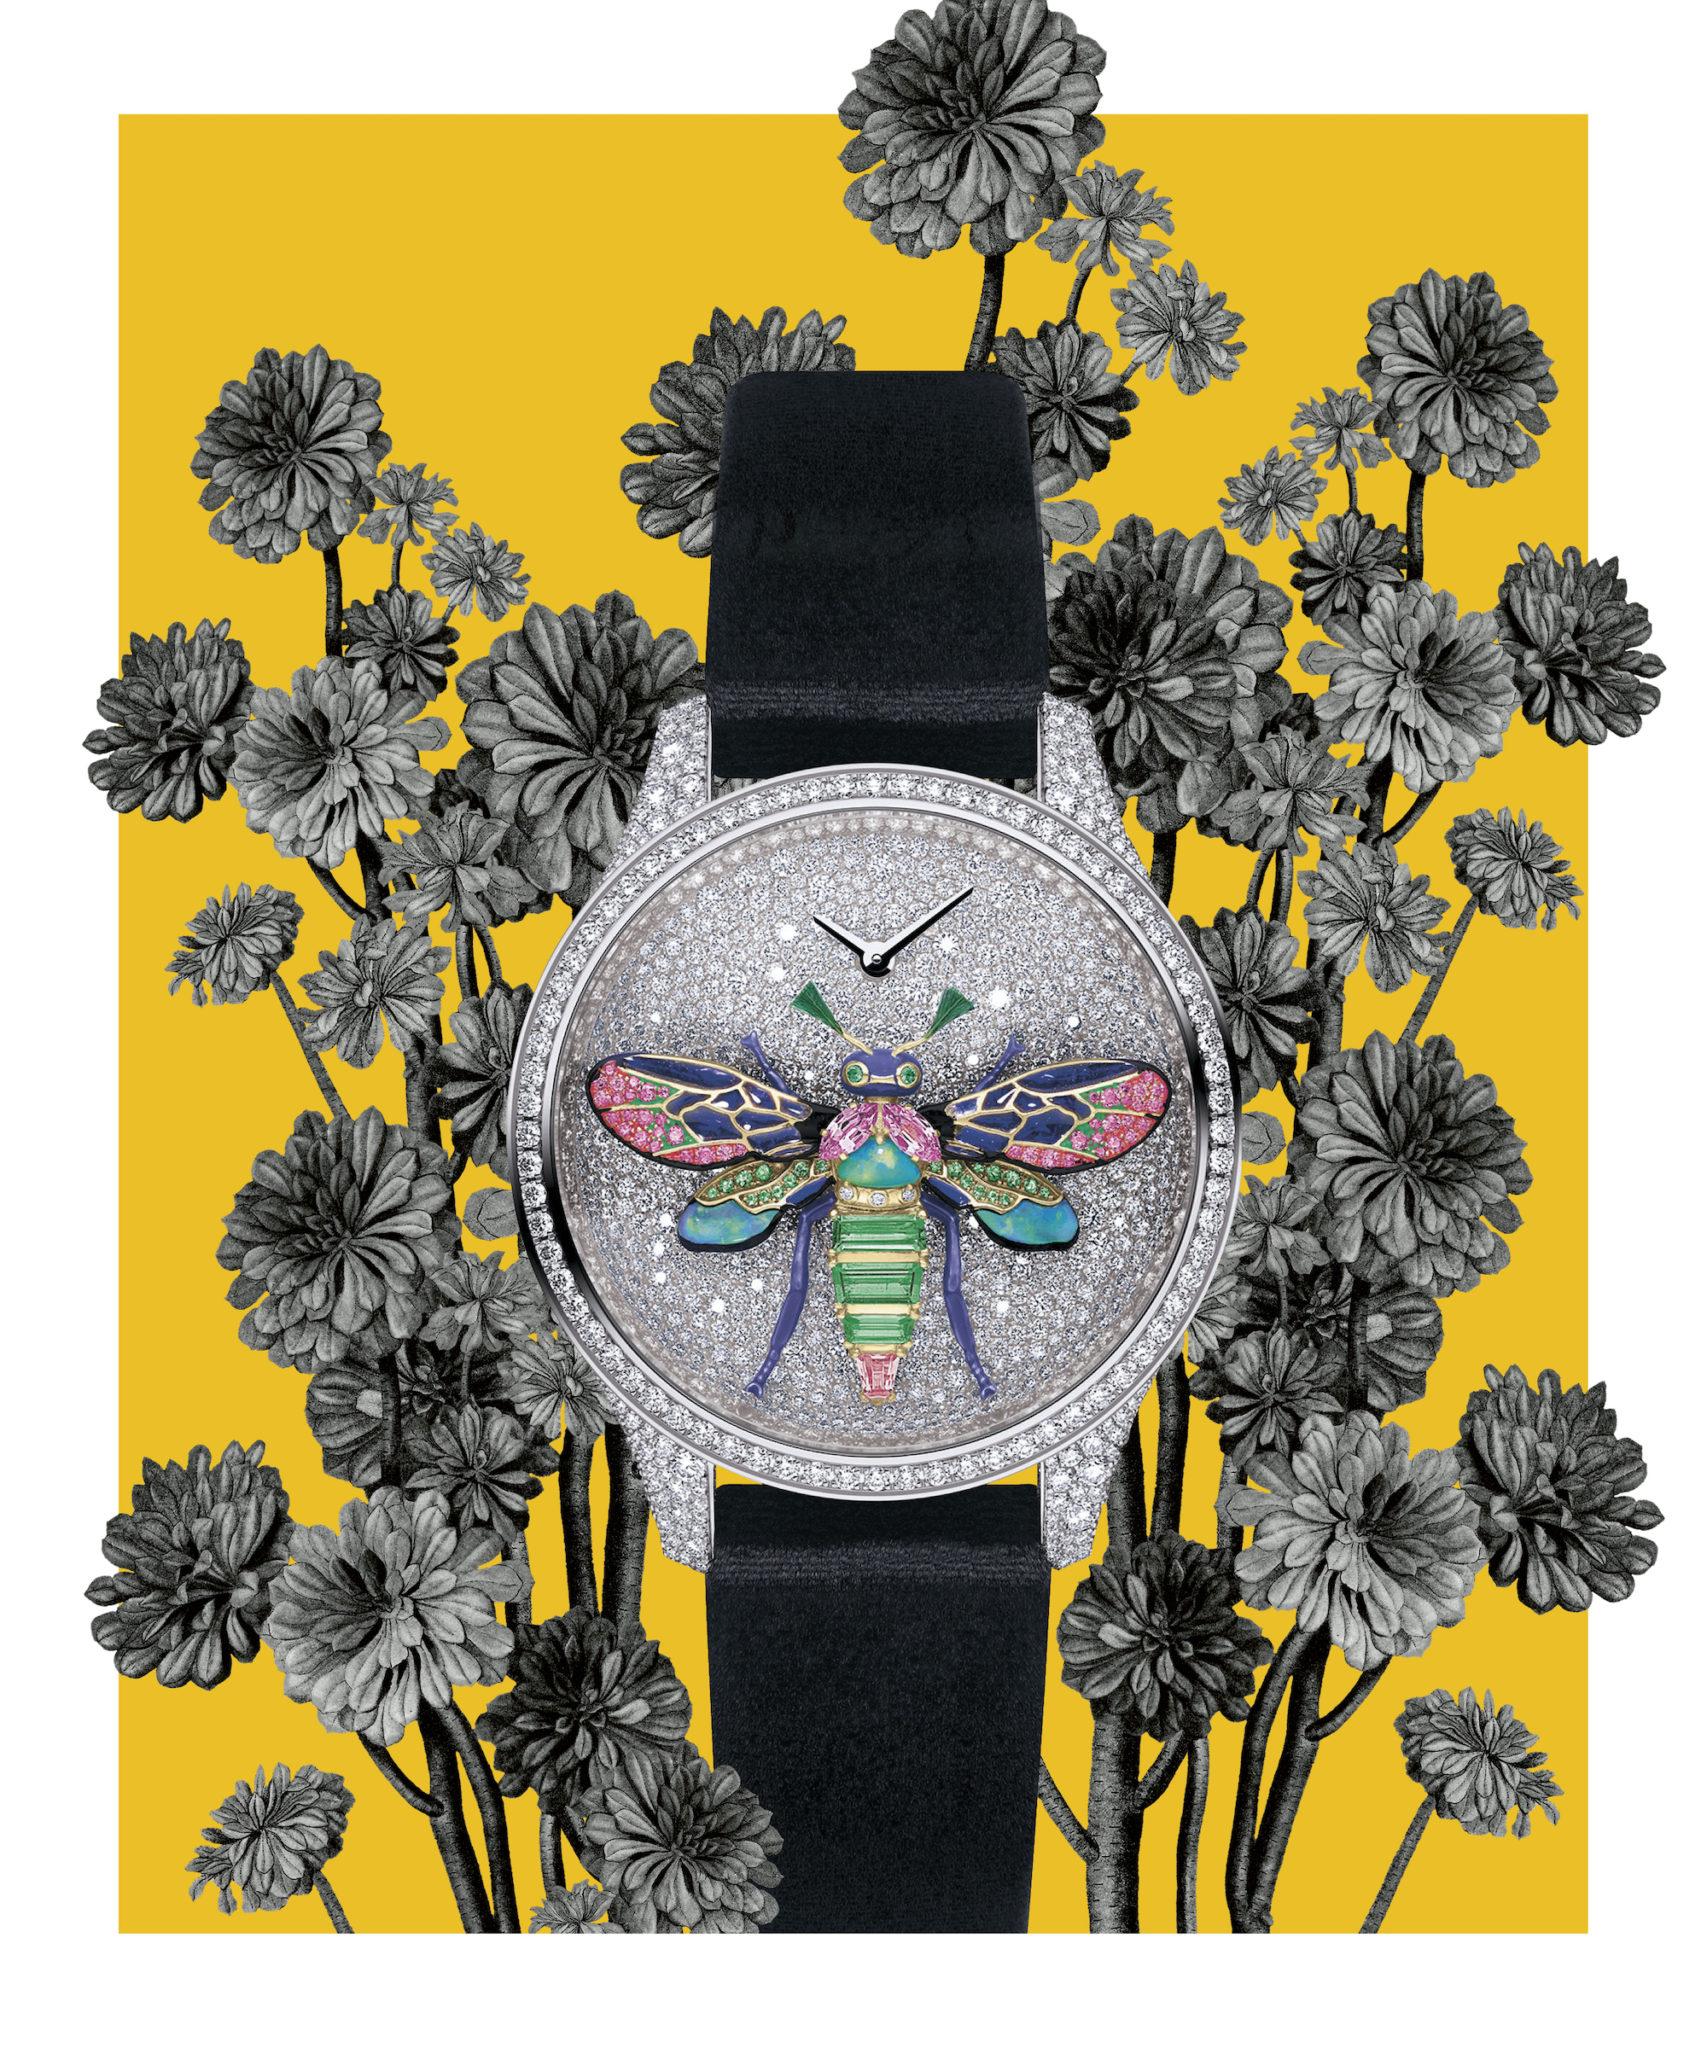 dior luxury timepieces